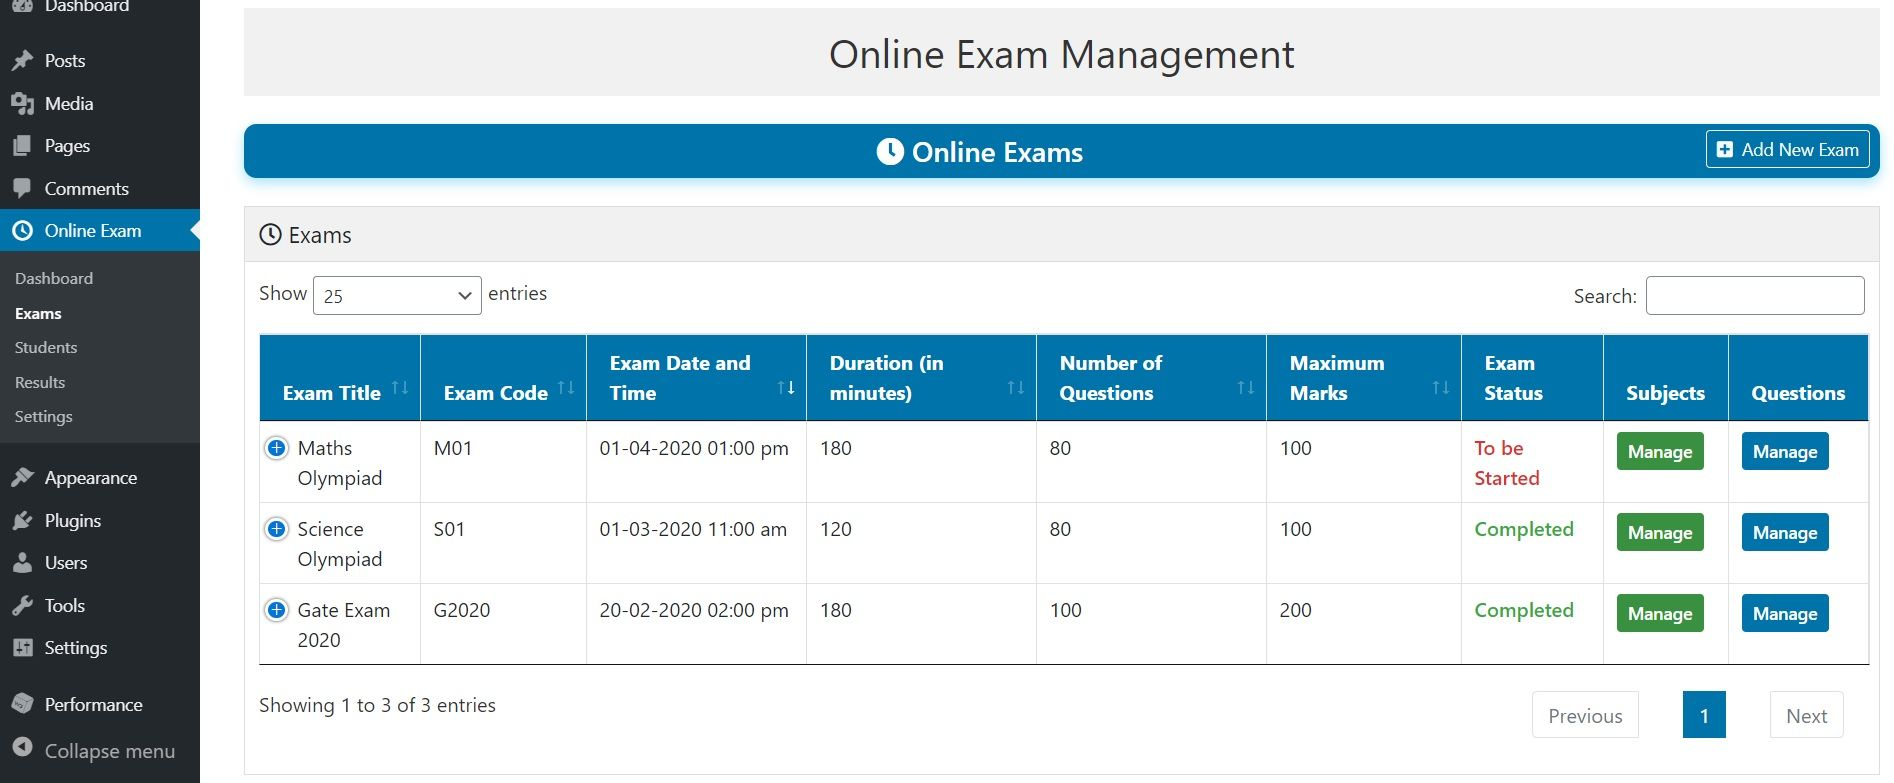 Online Exam Management Education Results Management Exam Student Portfolios Education